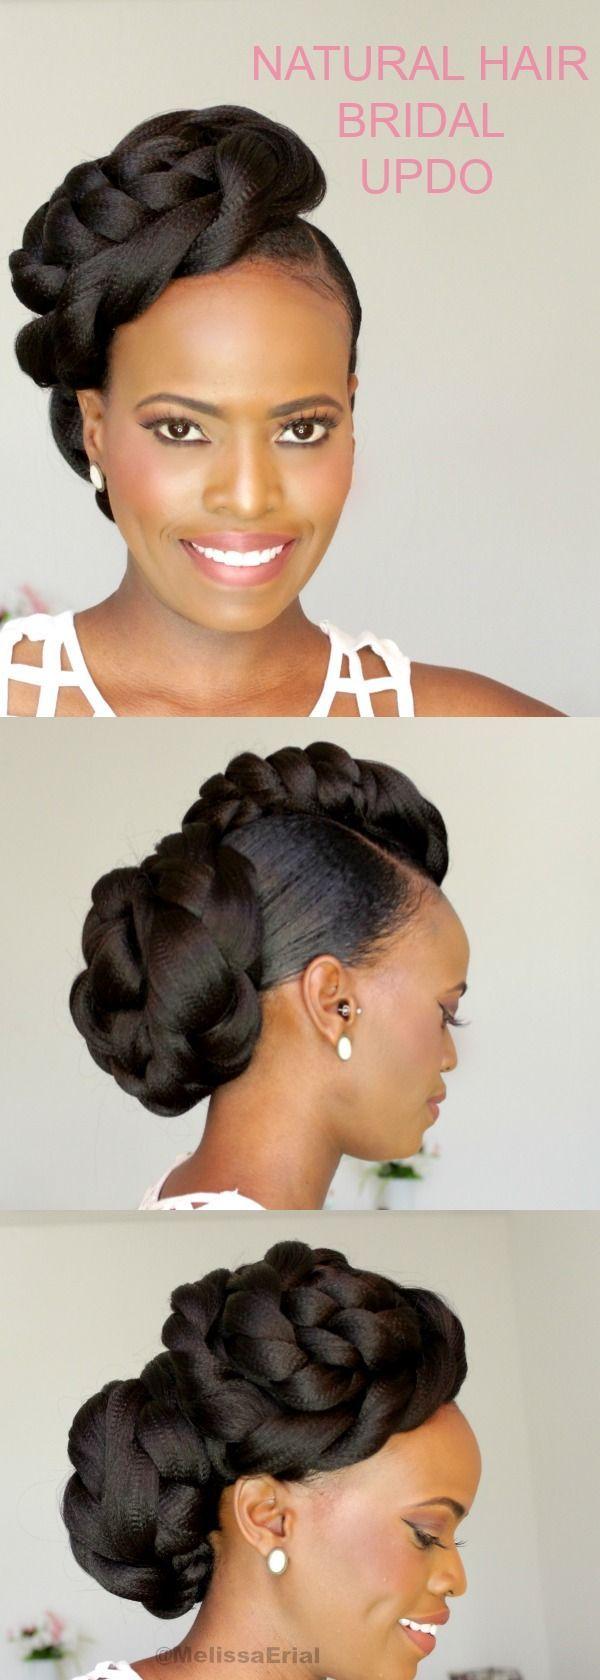 2019 natural hair bridal hairstyles for black women